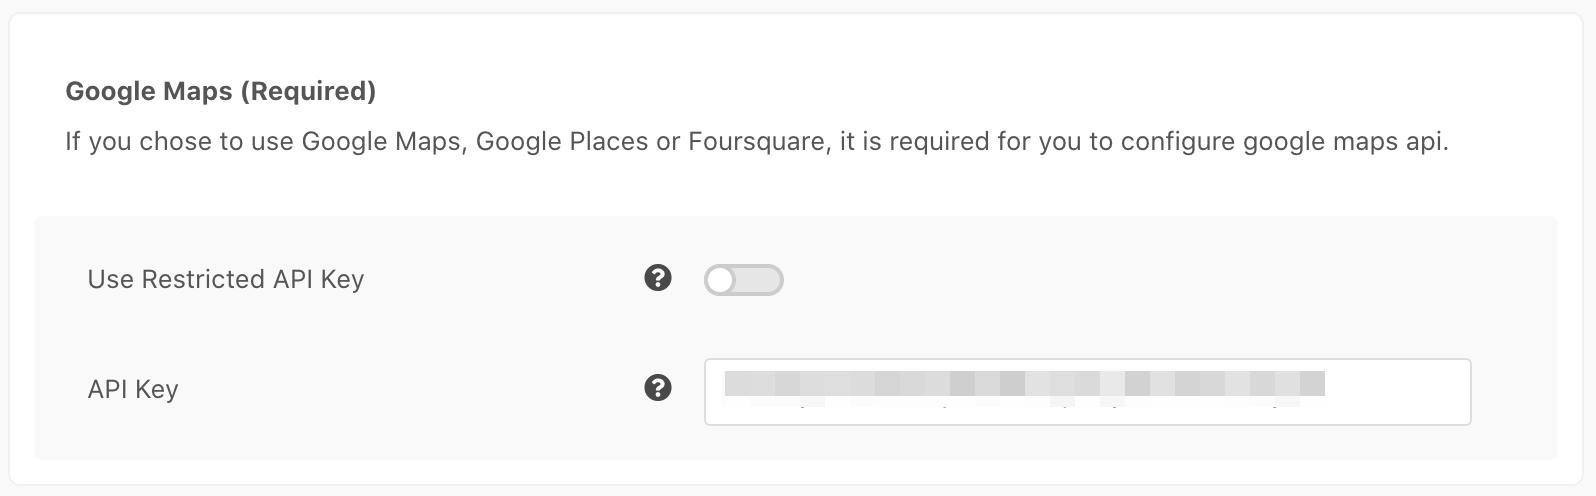 EasySocial Location Services Google Map